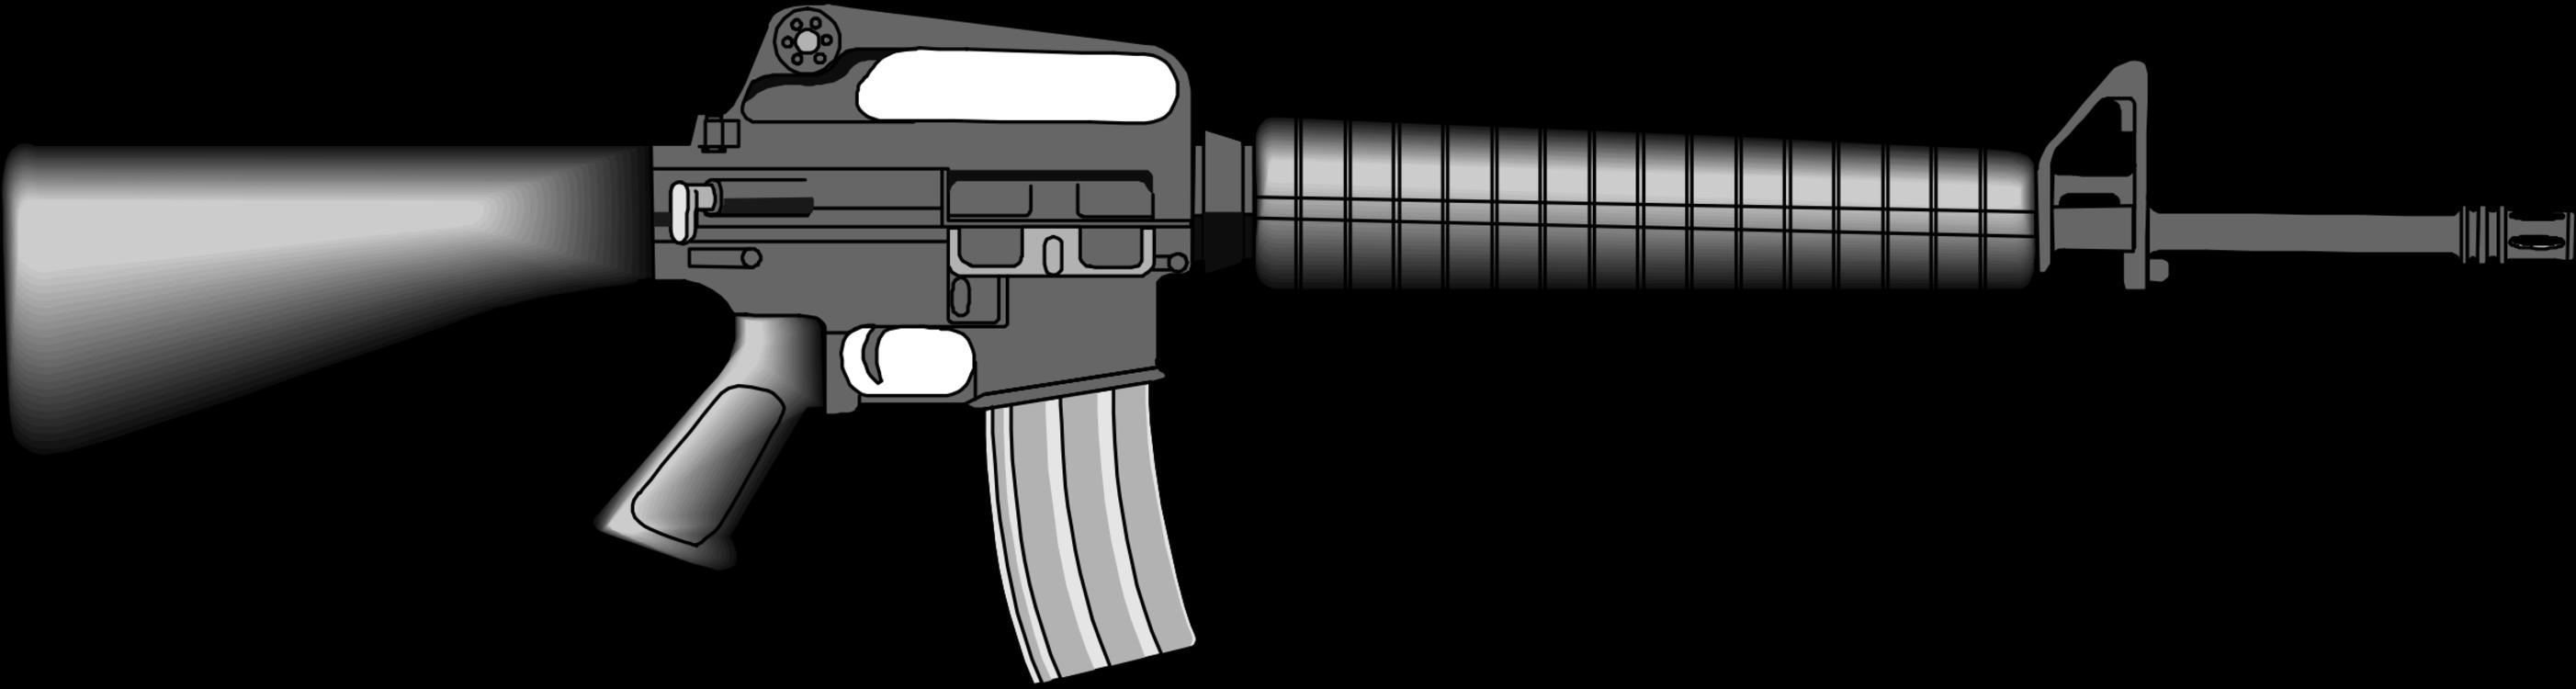 clipart royalty free Vector carbine transparent. M rifle weapon firearm